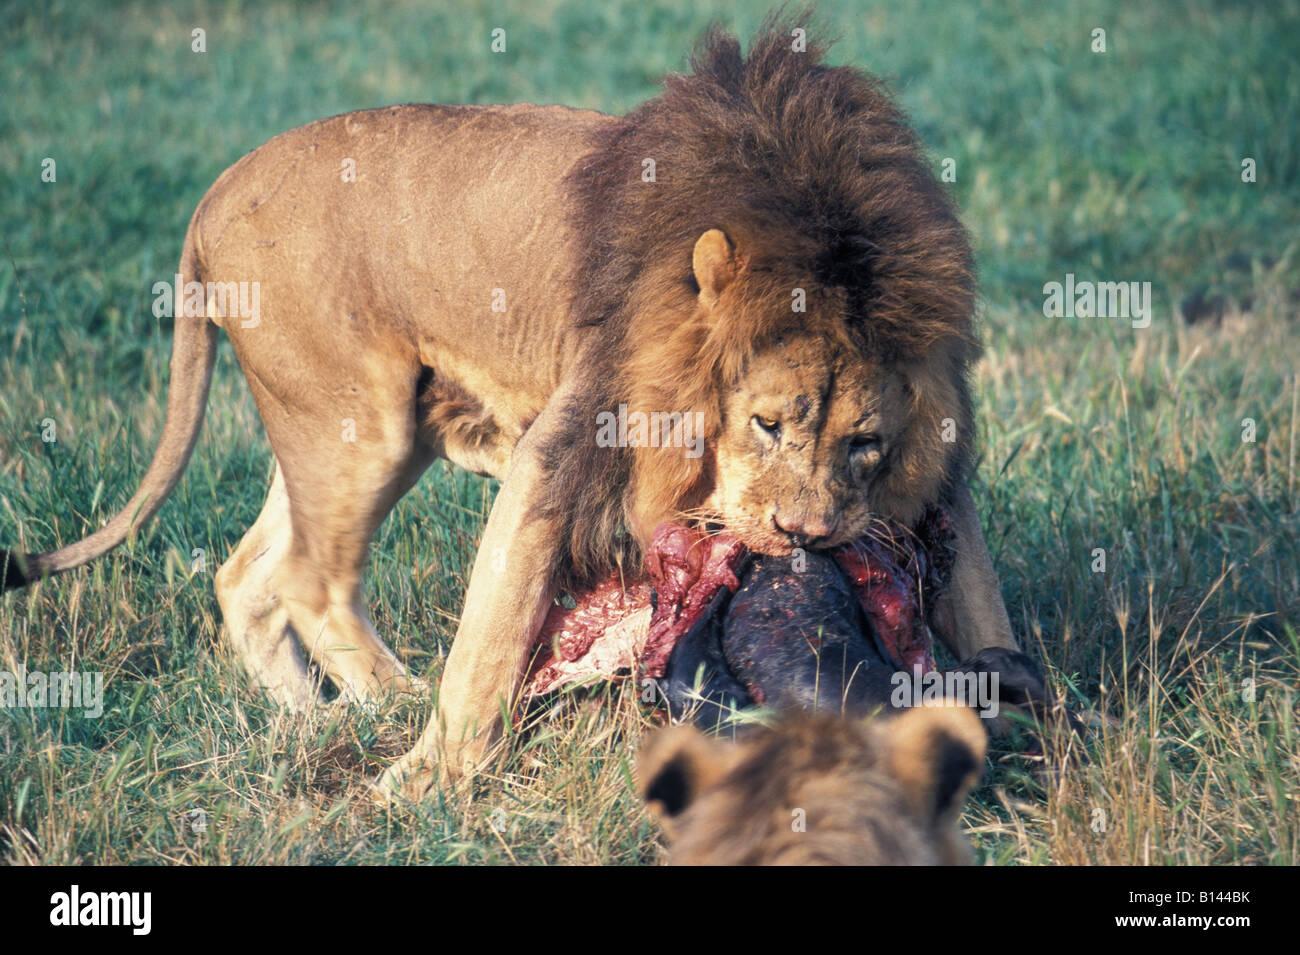 Lions eat a loot animal panthera leo animals carnivore hunt settles hunts lion nature wholeearth wildlife - Stock Image